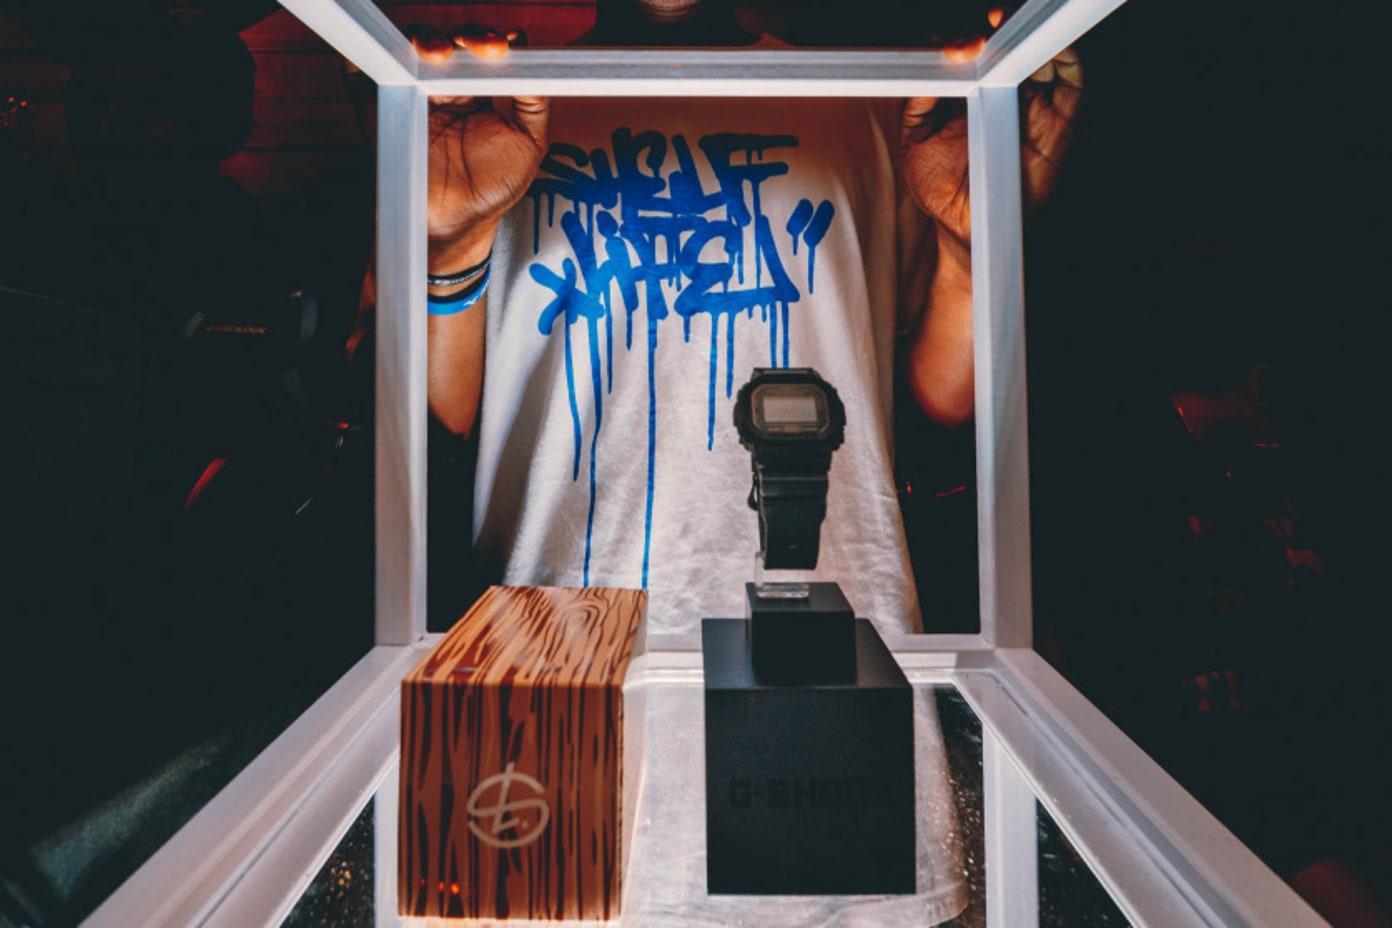 Shelflife X G-Shock Watch Collaboration – Cape Town Recap